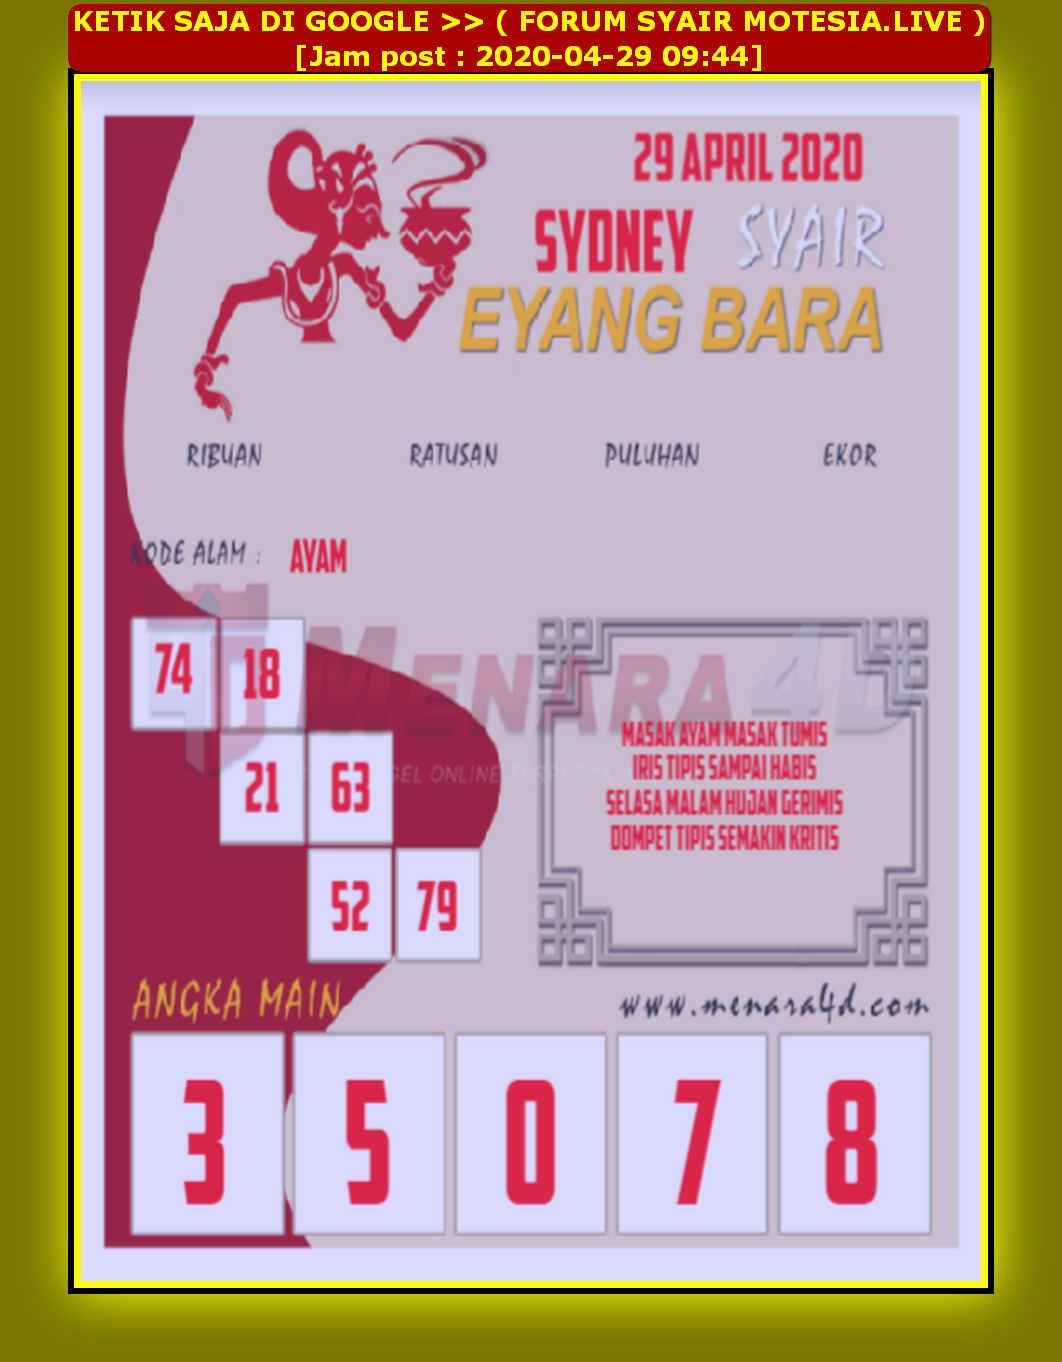 Kode syair Sydney Rabu 29 April 2020 66